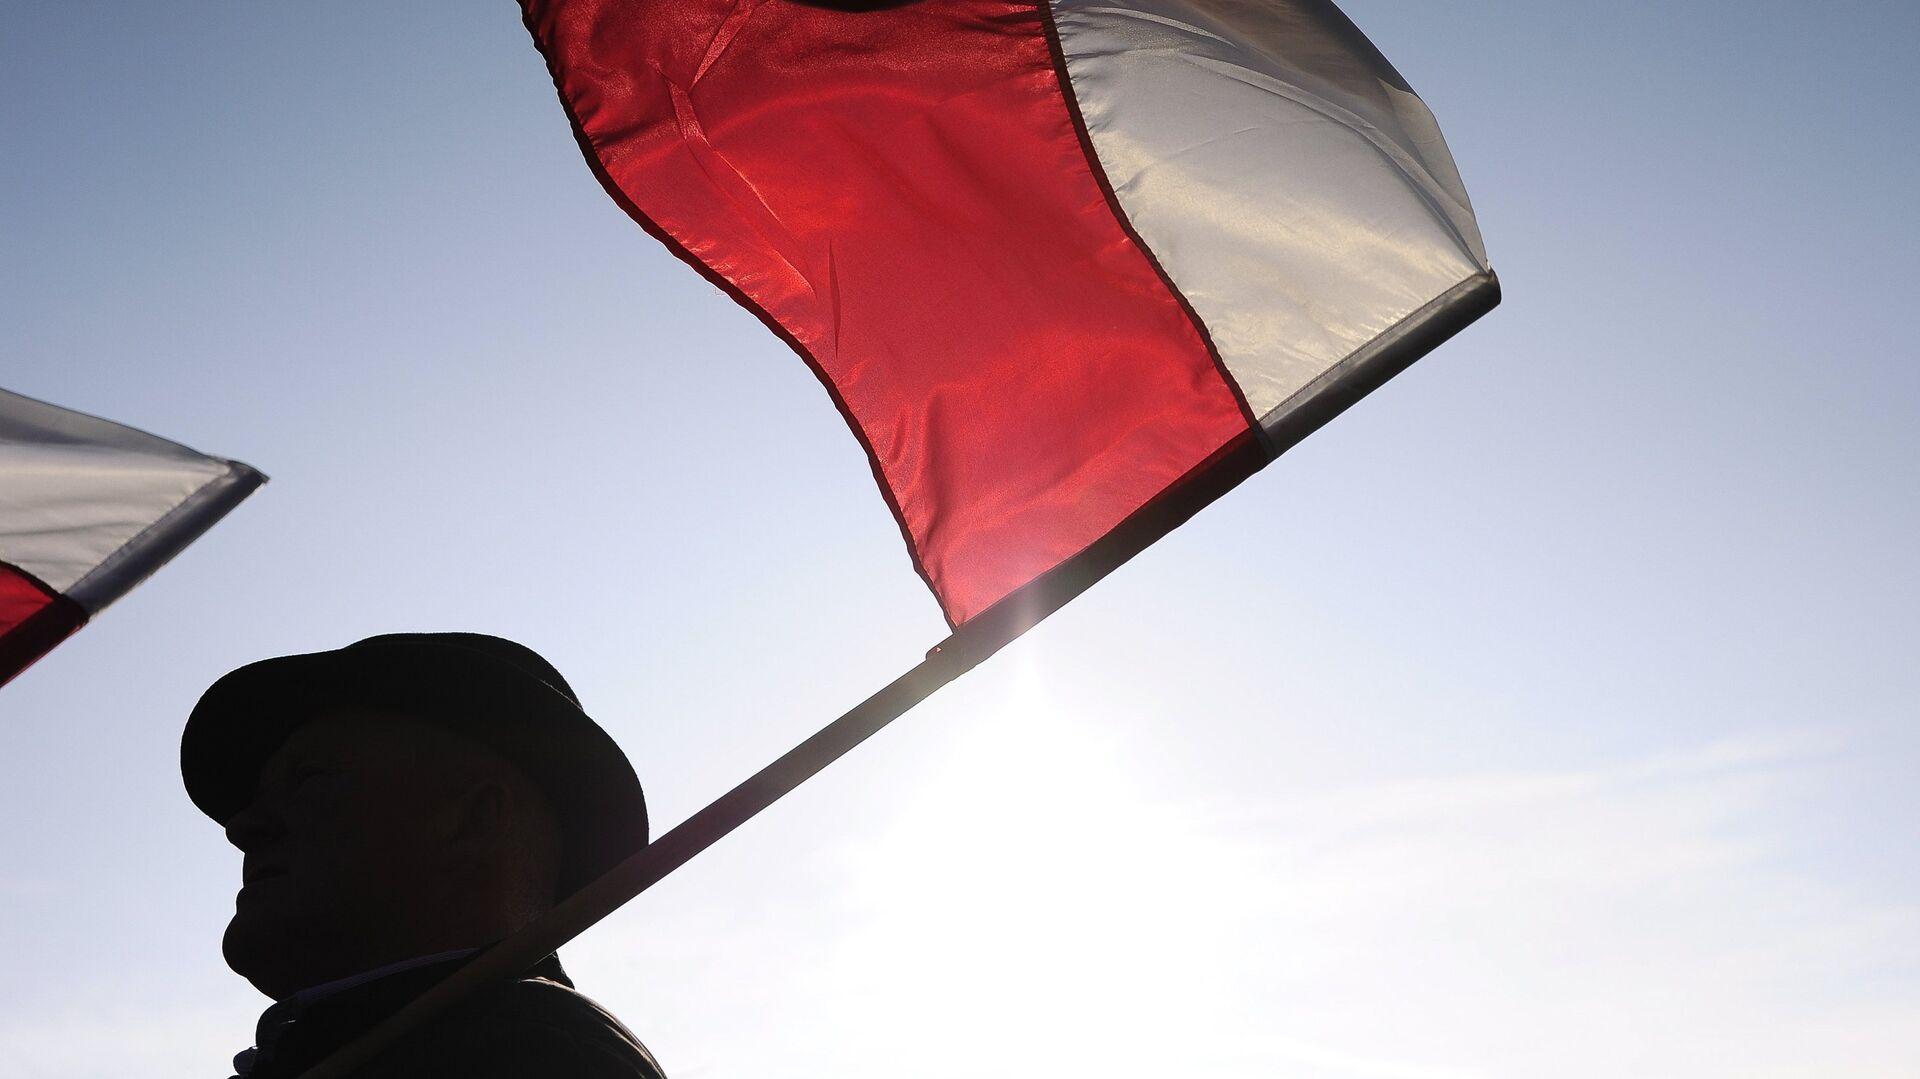 Мужчина с флагом Польши - РИА Новости, 1920, 11.06.2021